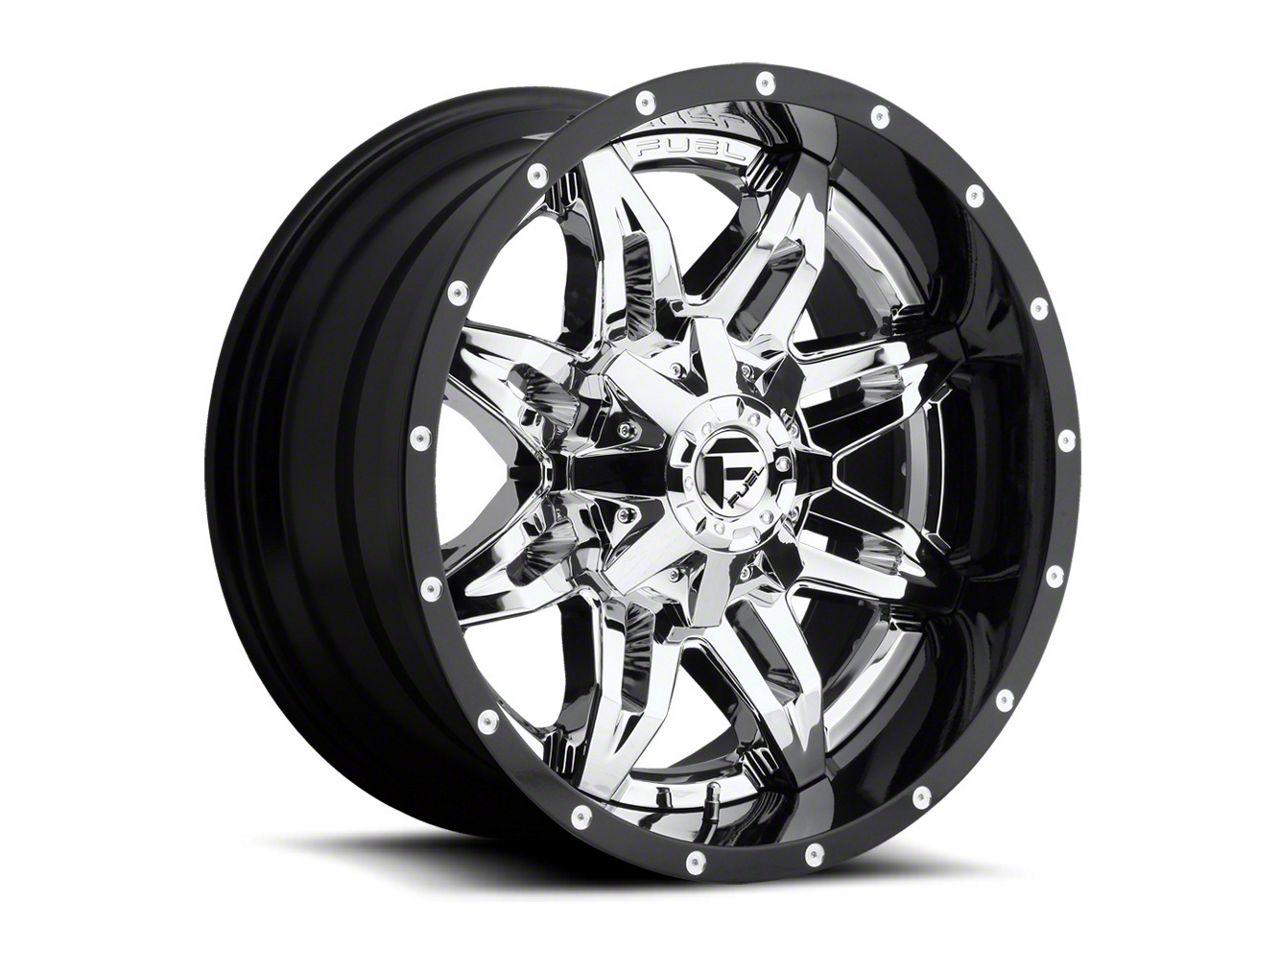 Fuel Wheels Lethal Chrome 6-Lug Wheel - 22x10 (99-18 Silverado 1500)